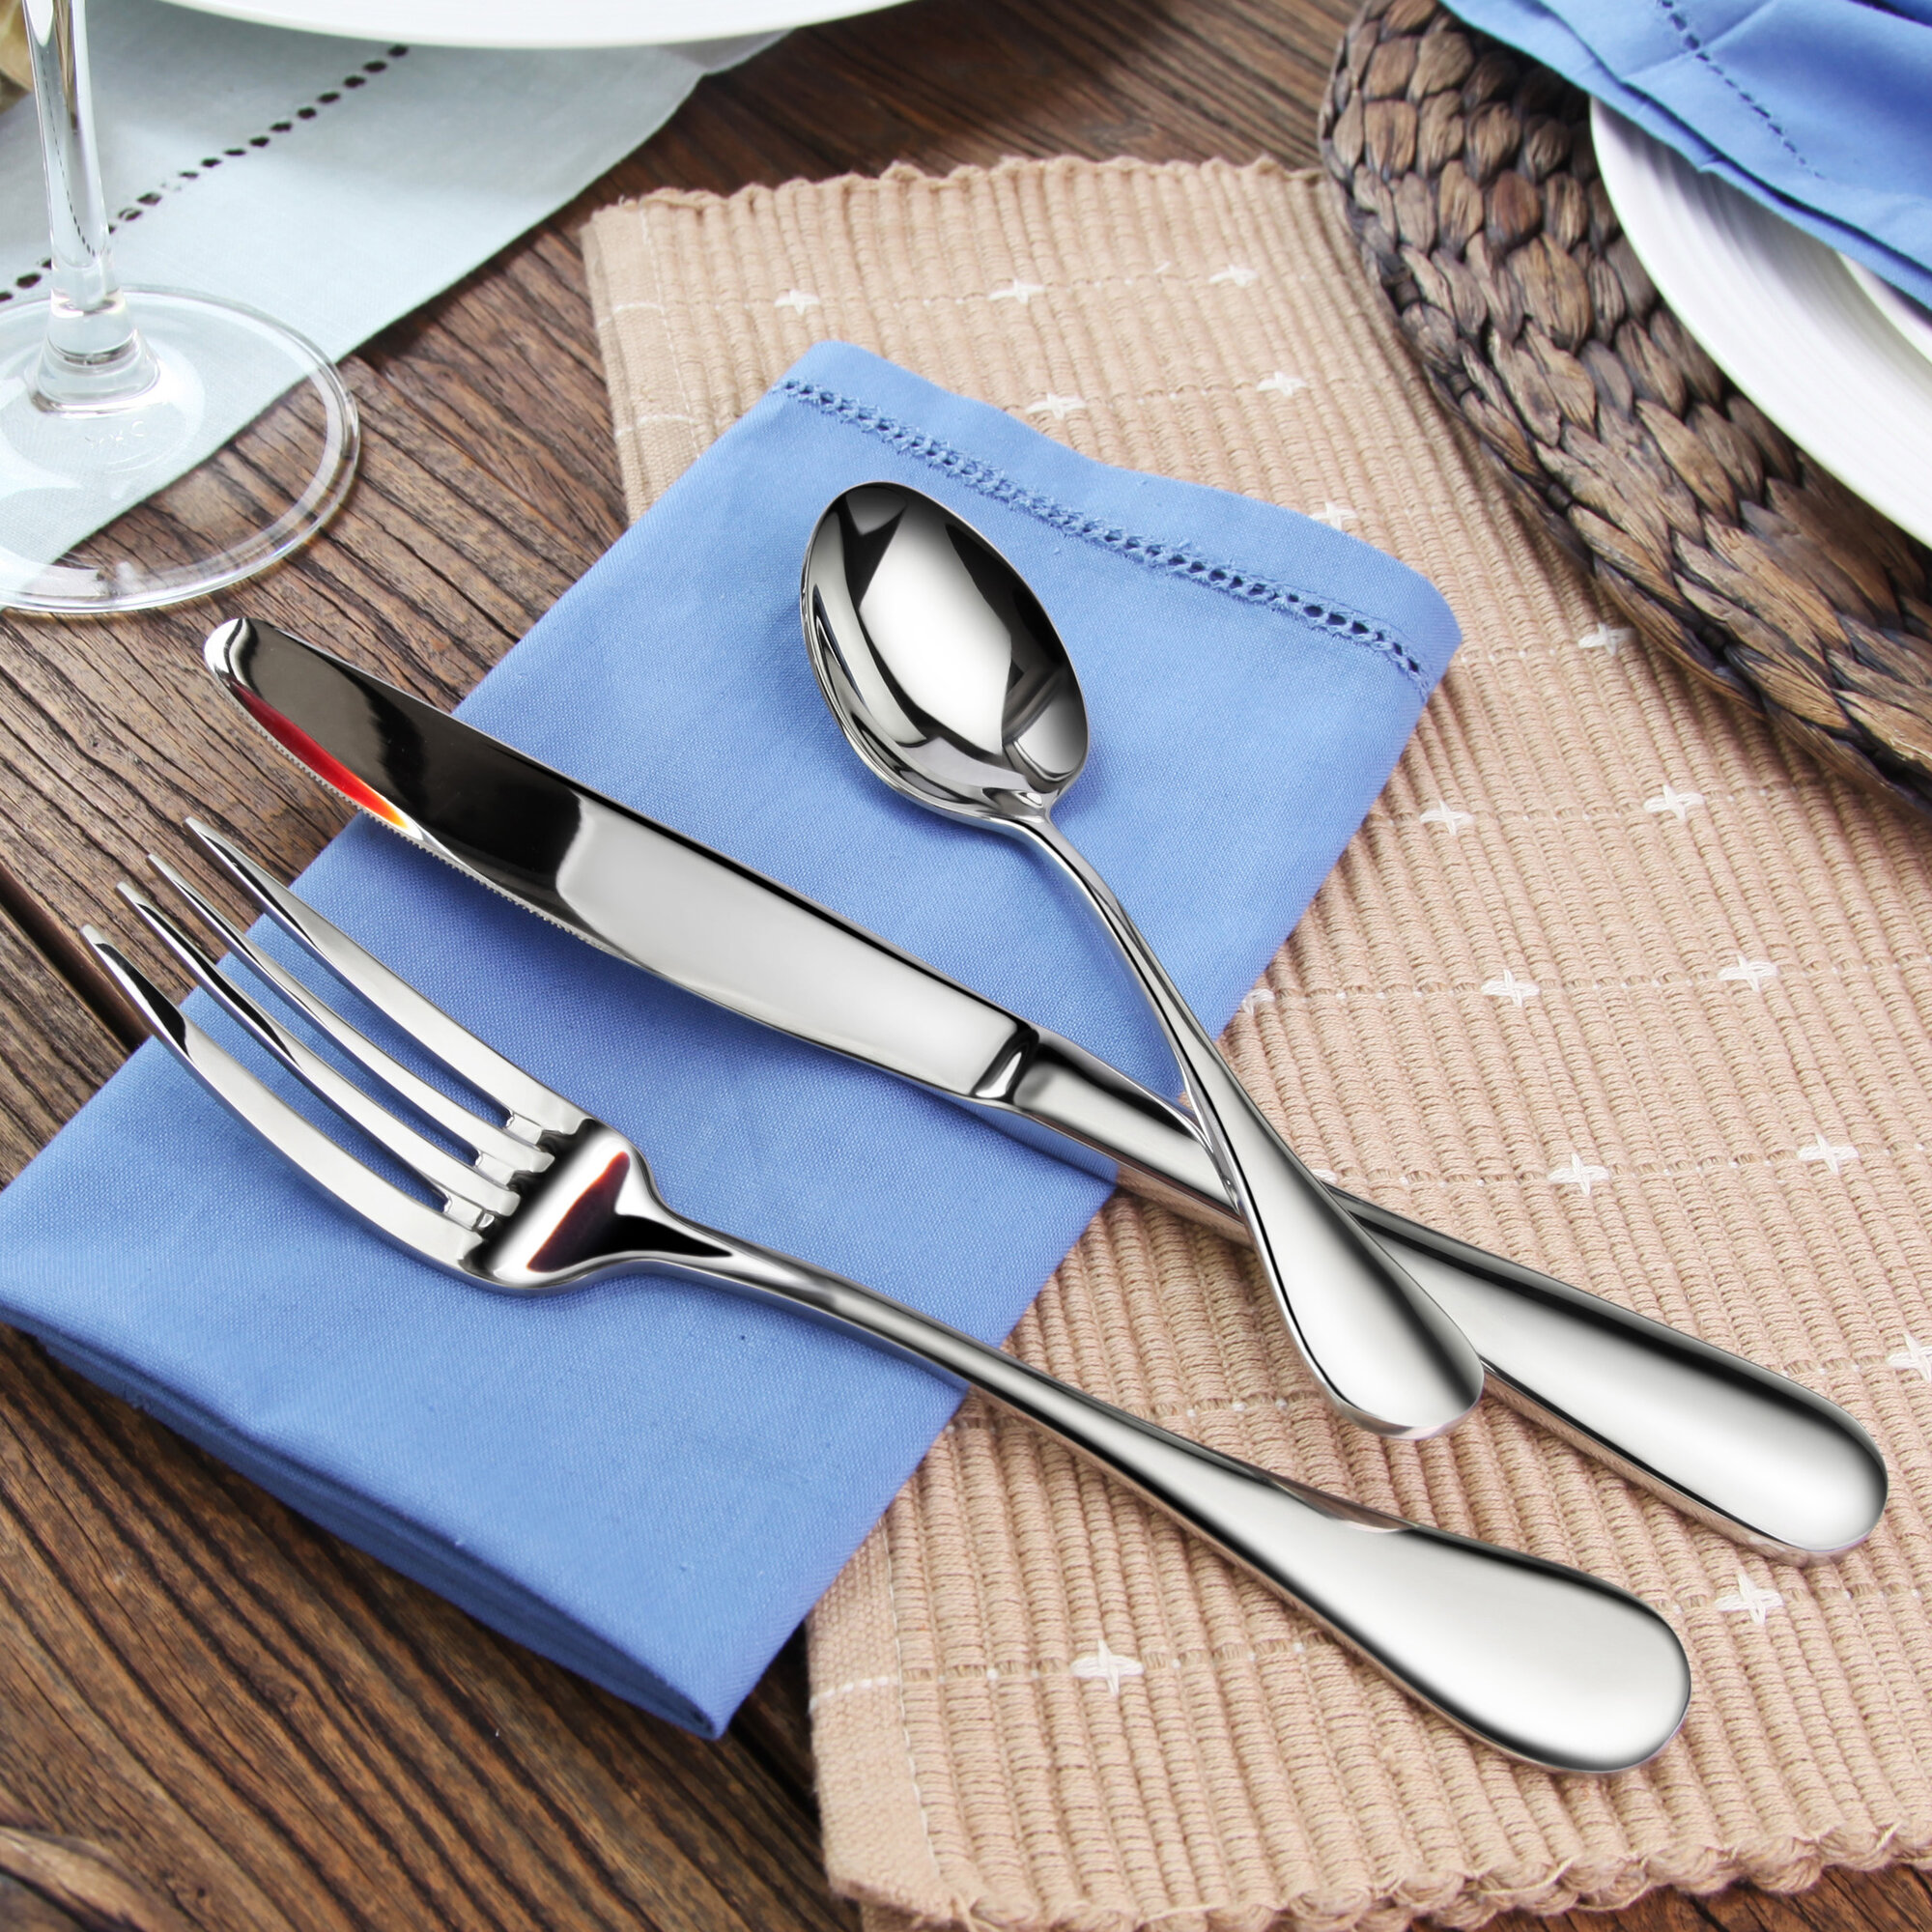 artaste rain 36 piece 18 10 stainless steel flatware set ebay. Black Bedroom Furniture Sets. Home Design Ideas